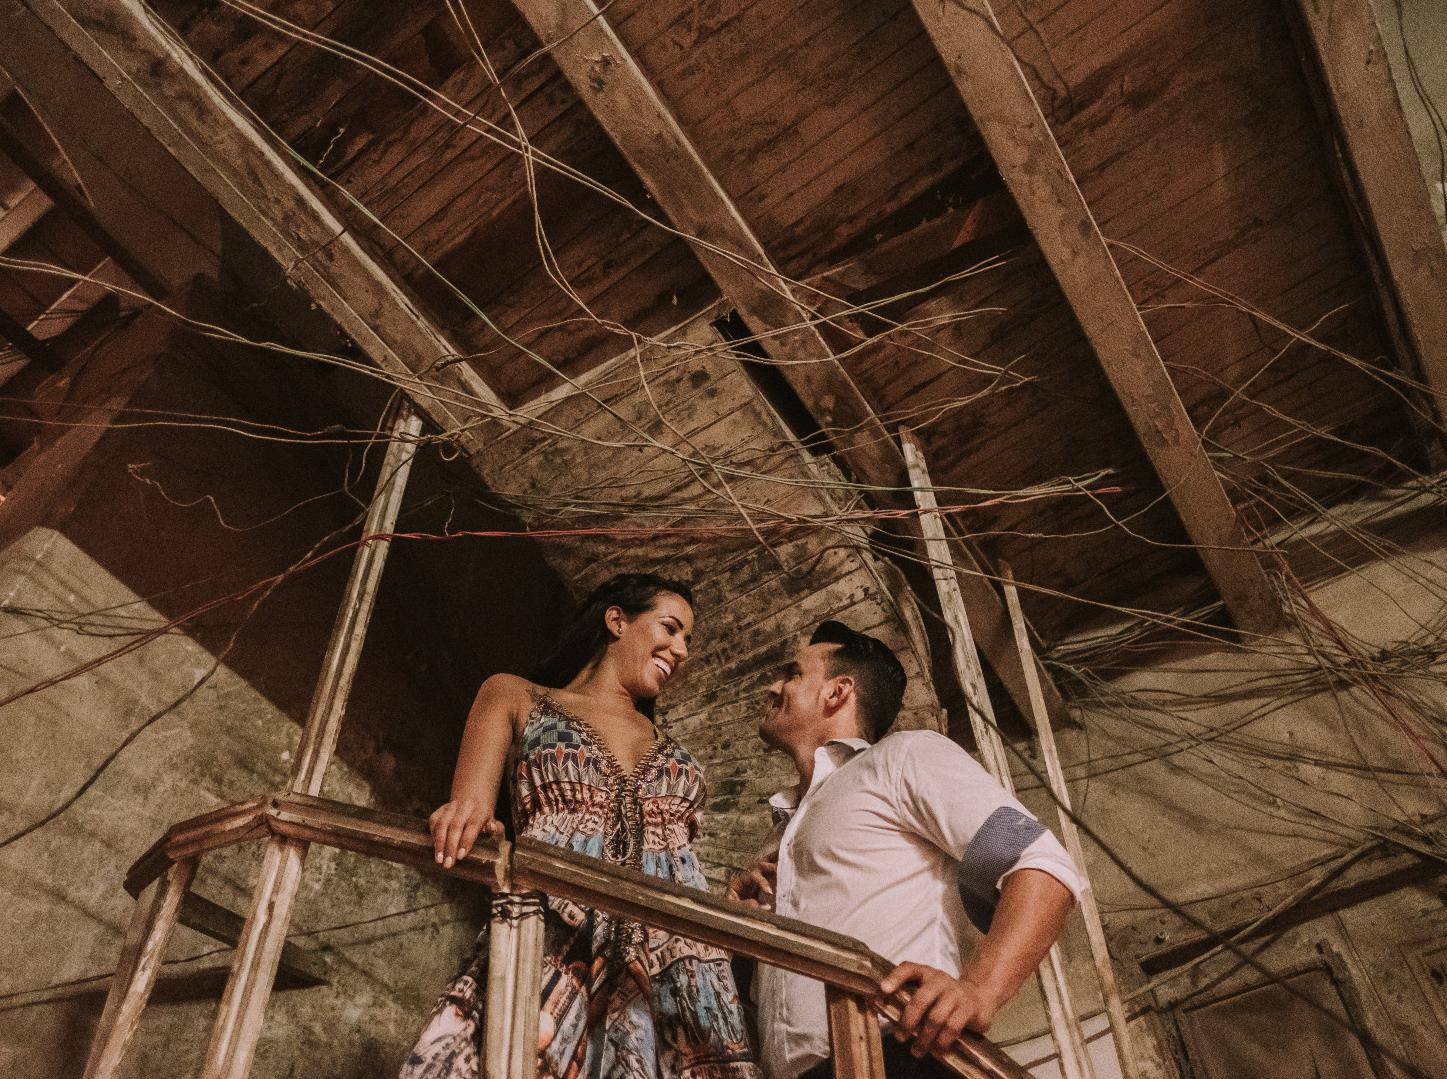 bodas-sin-clasificar-sin-tema-cuba-35341.jpg